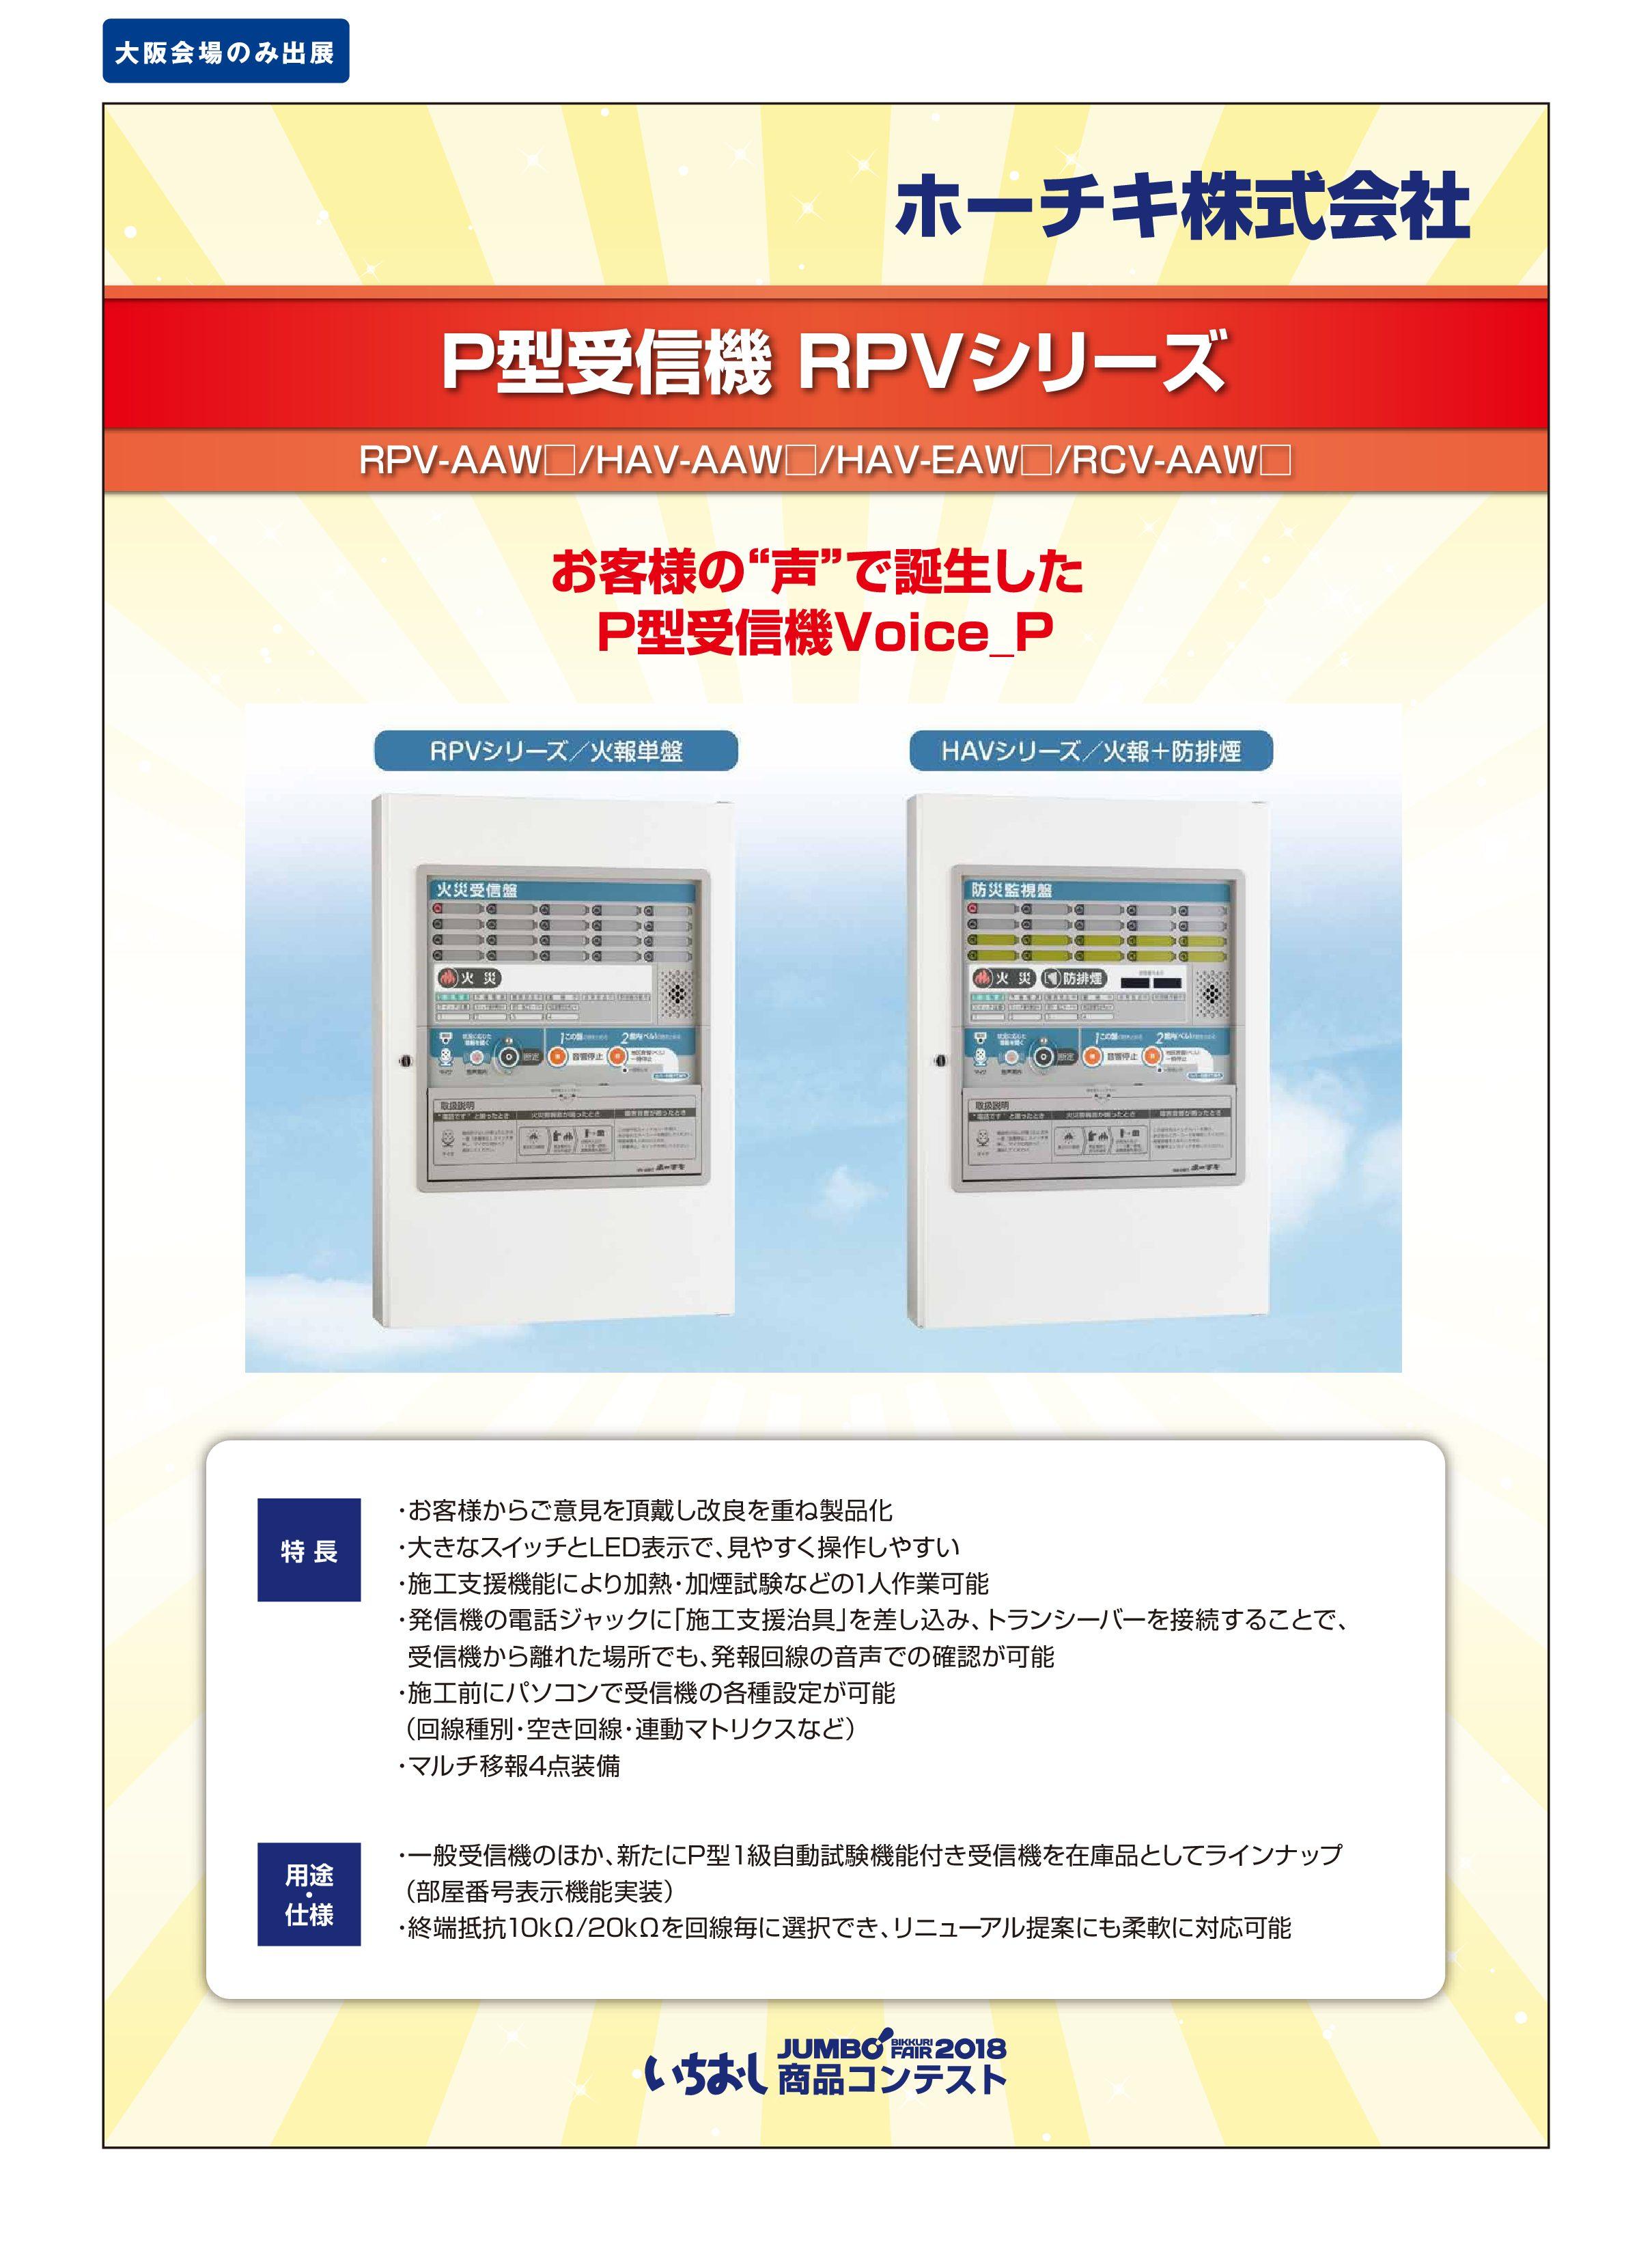 「P型受信機 RPVシリーズ」ホーチキ株式会社の画像